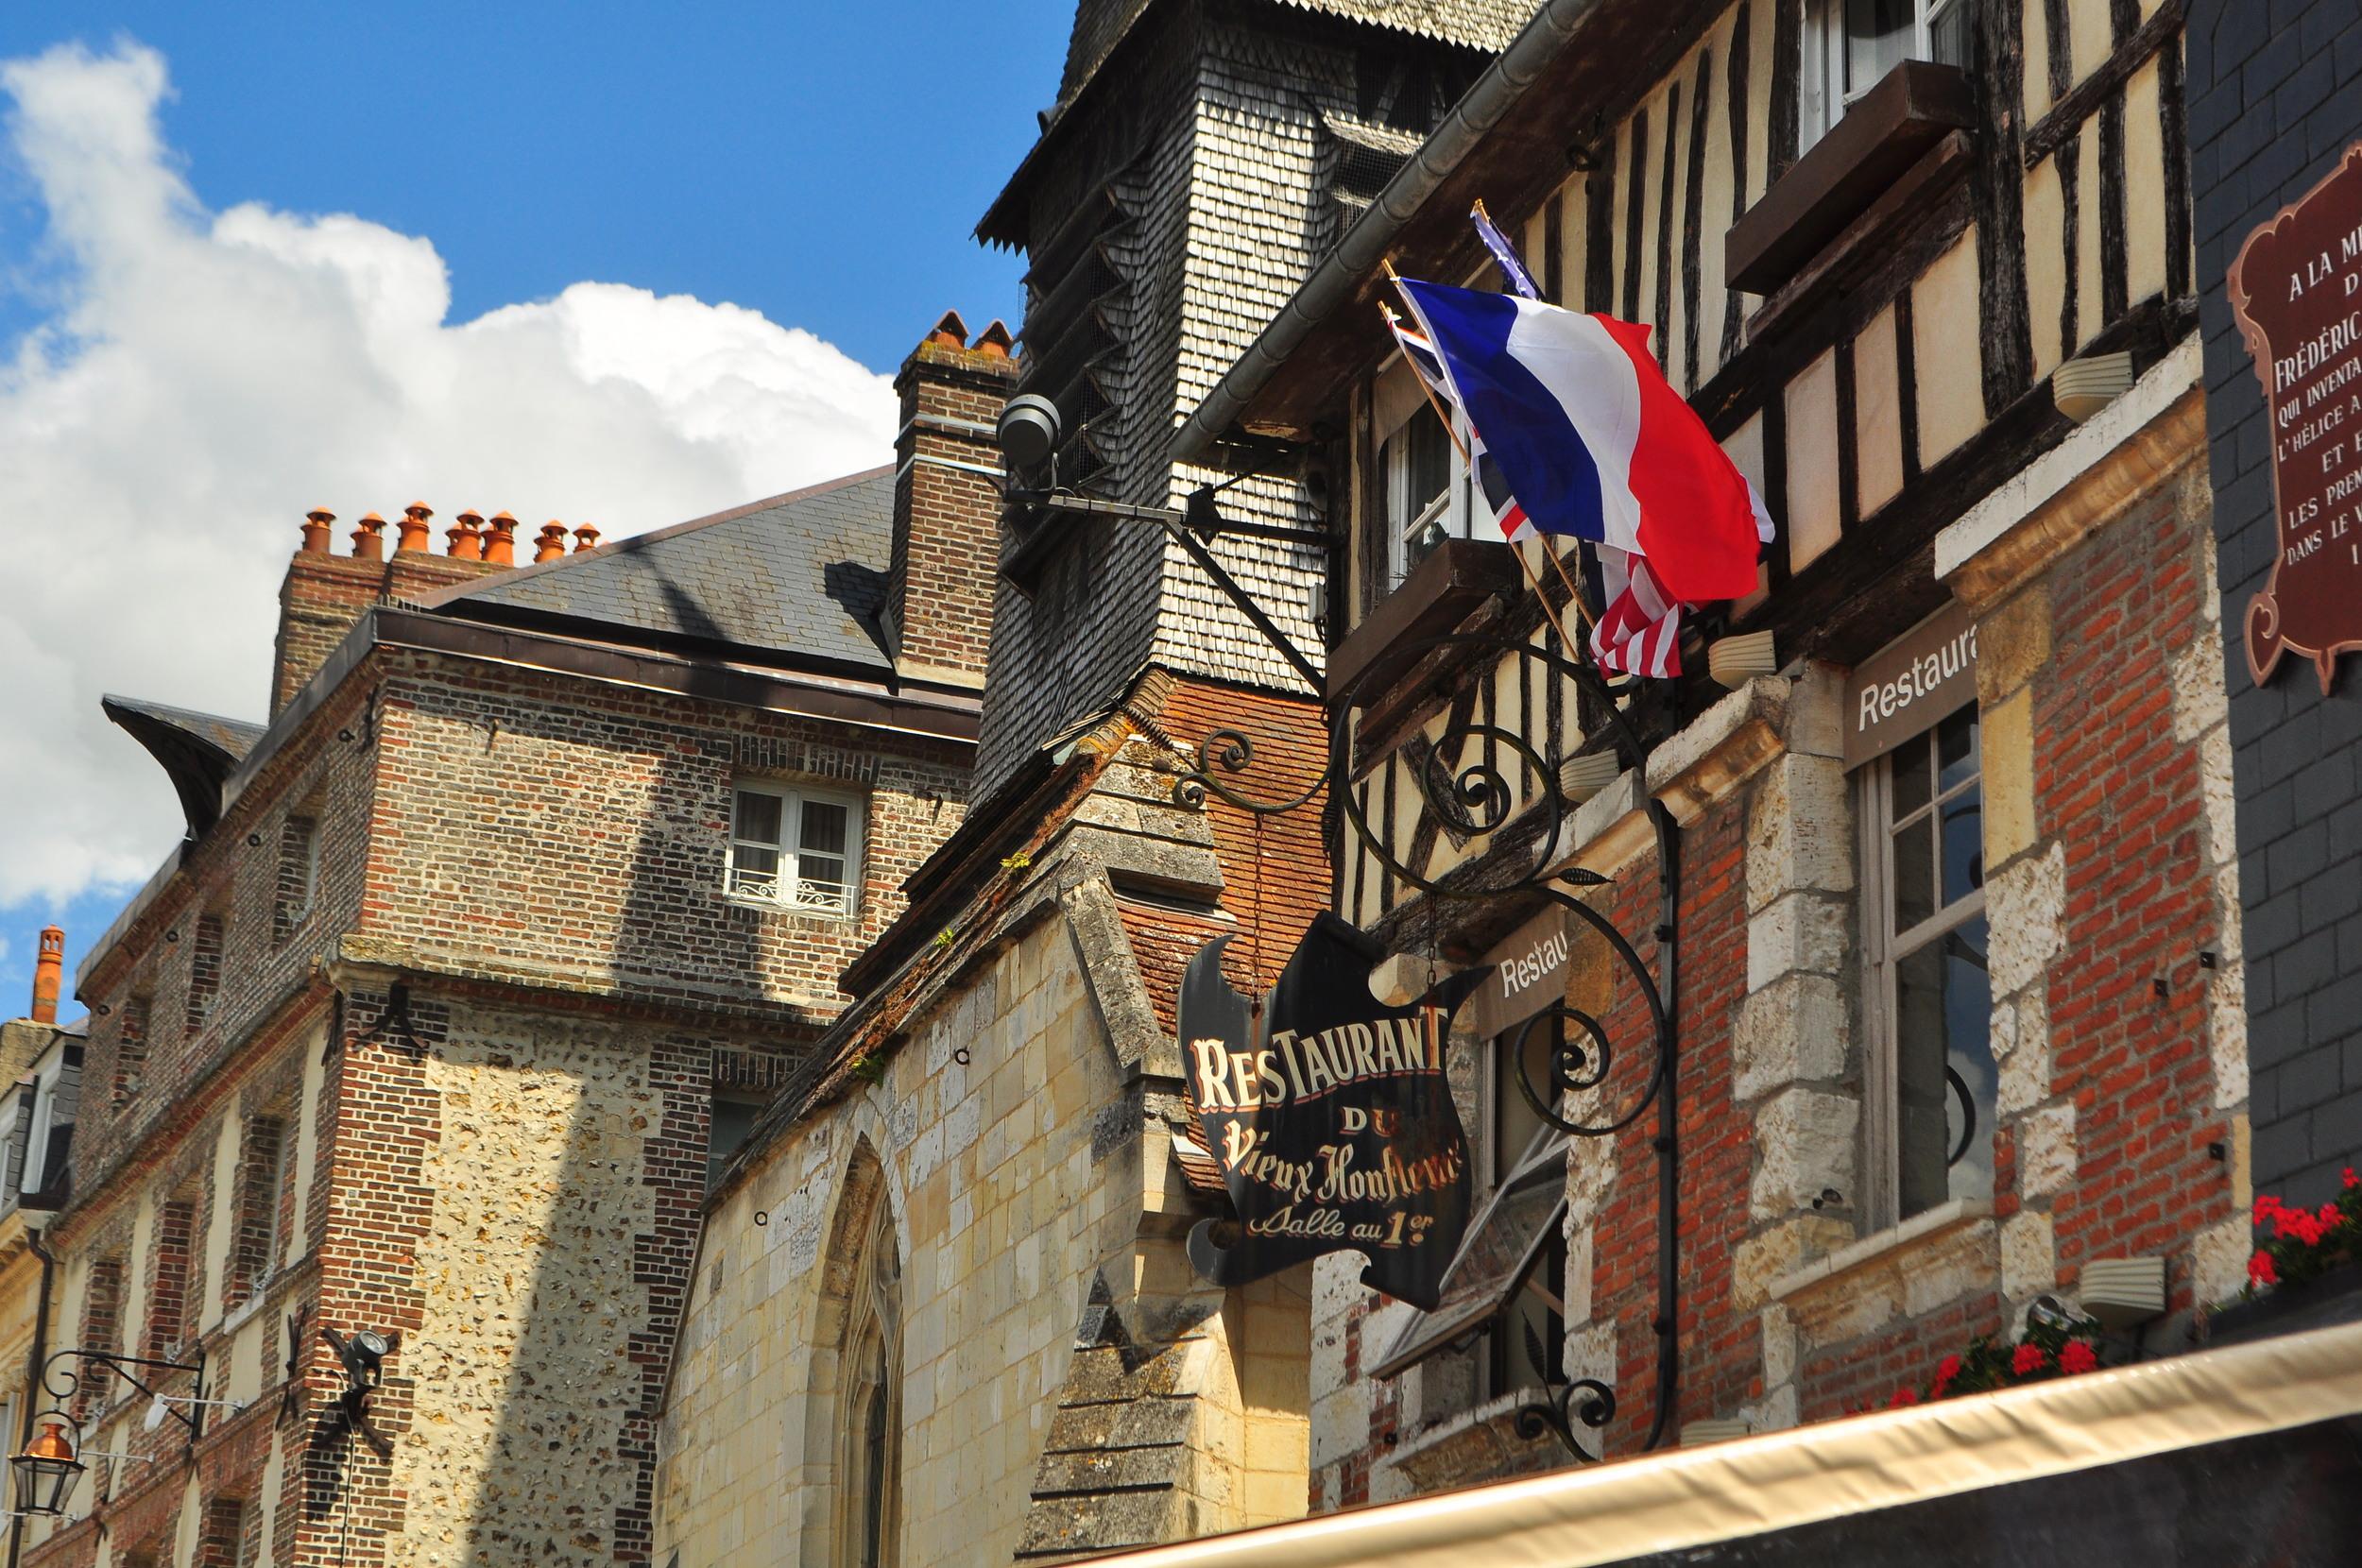 Honfleur, France - birthplace of Impressionism